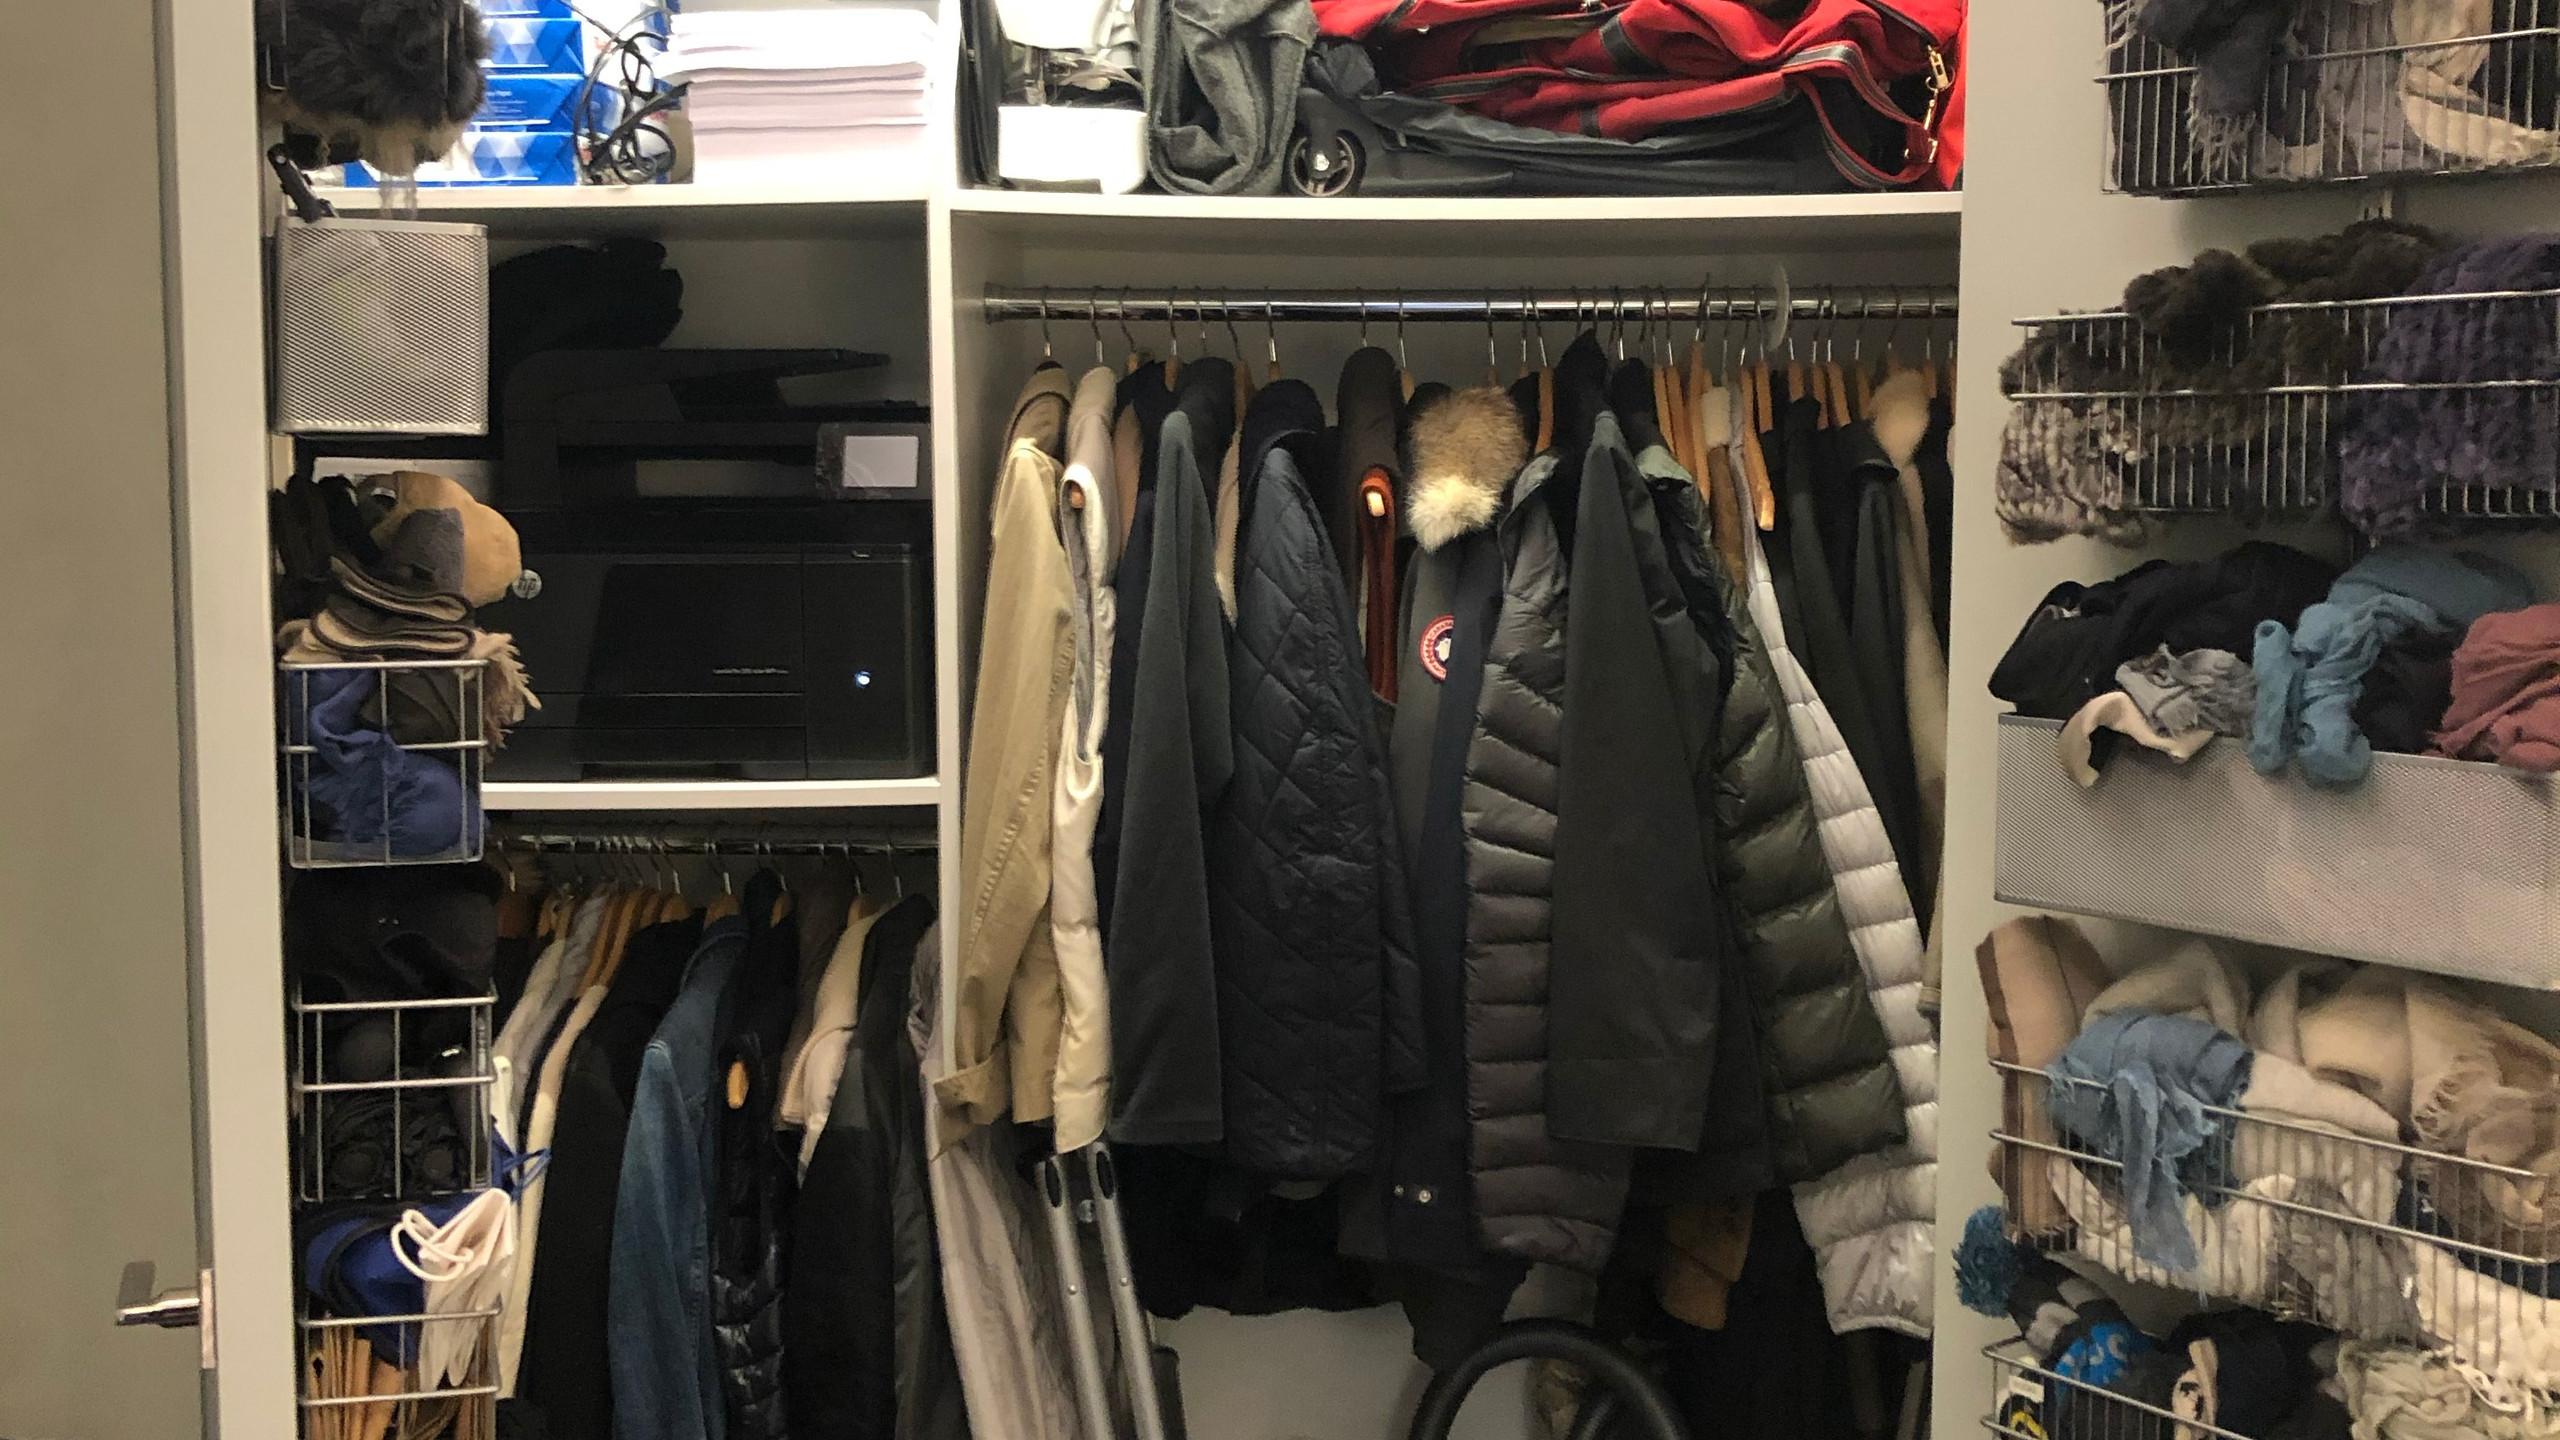 Messy closet before